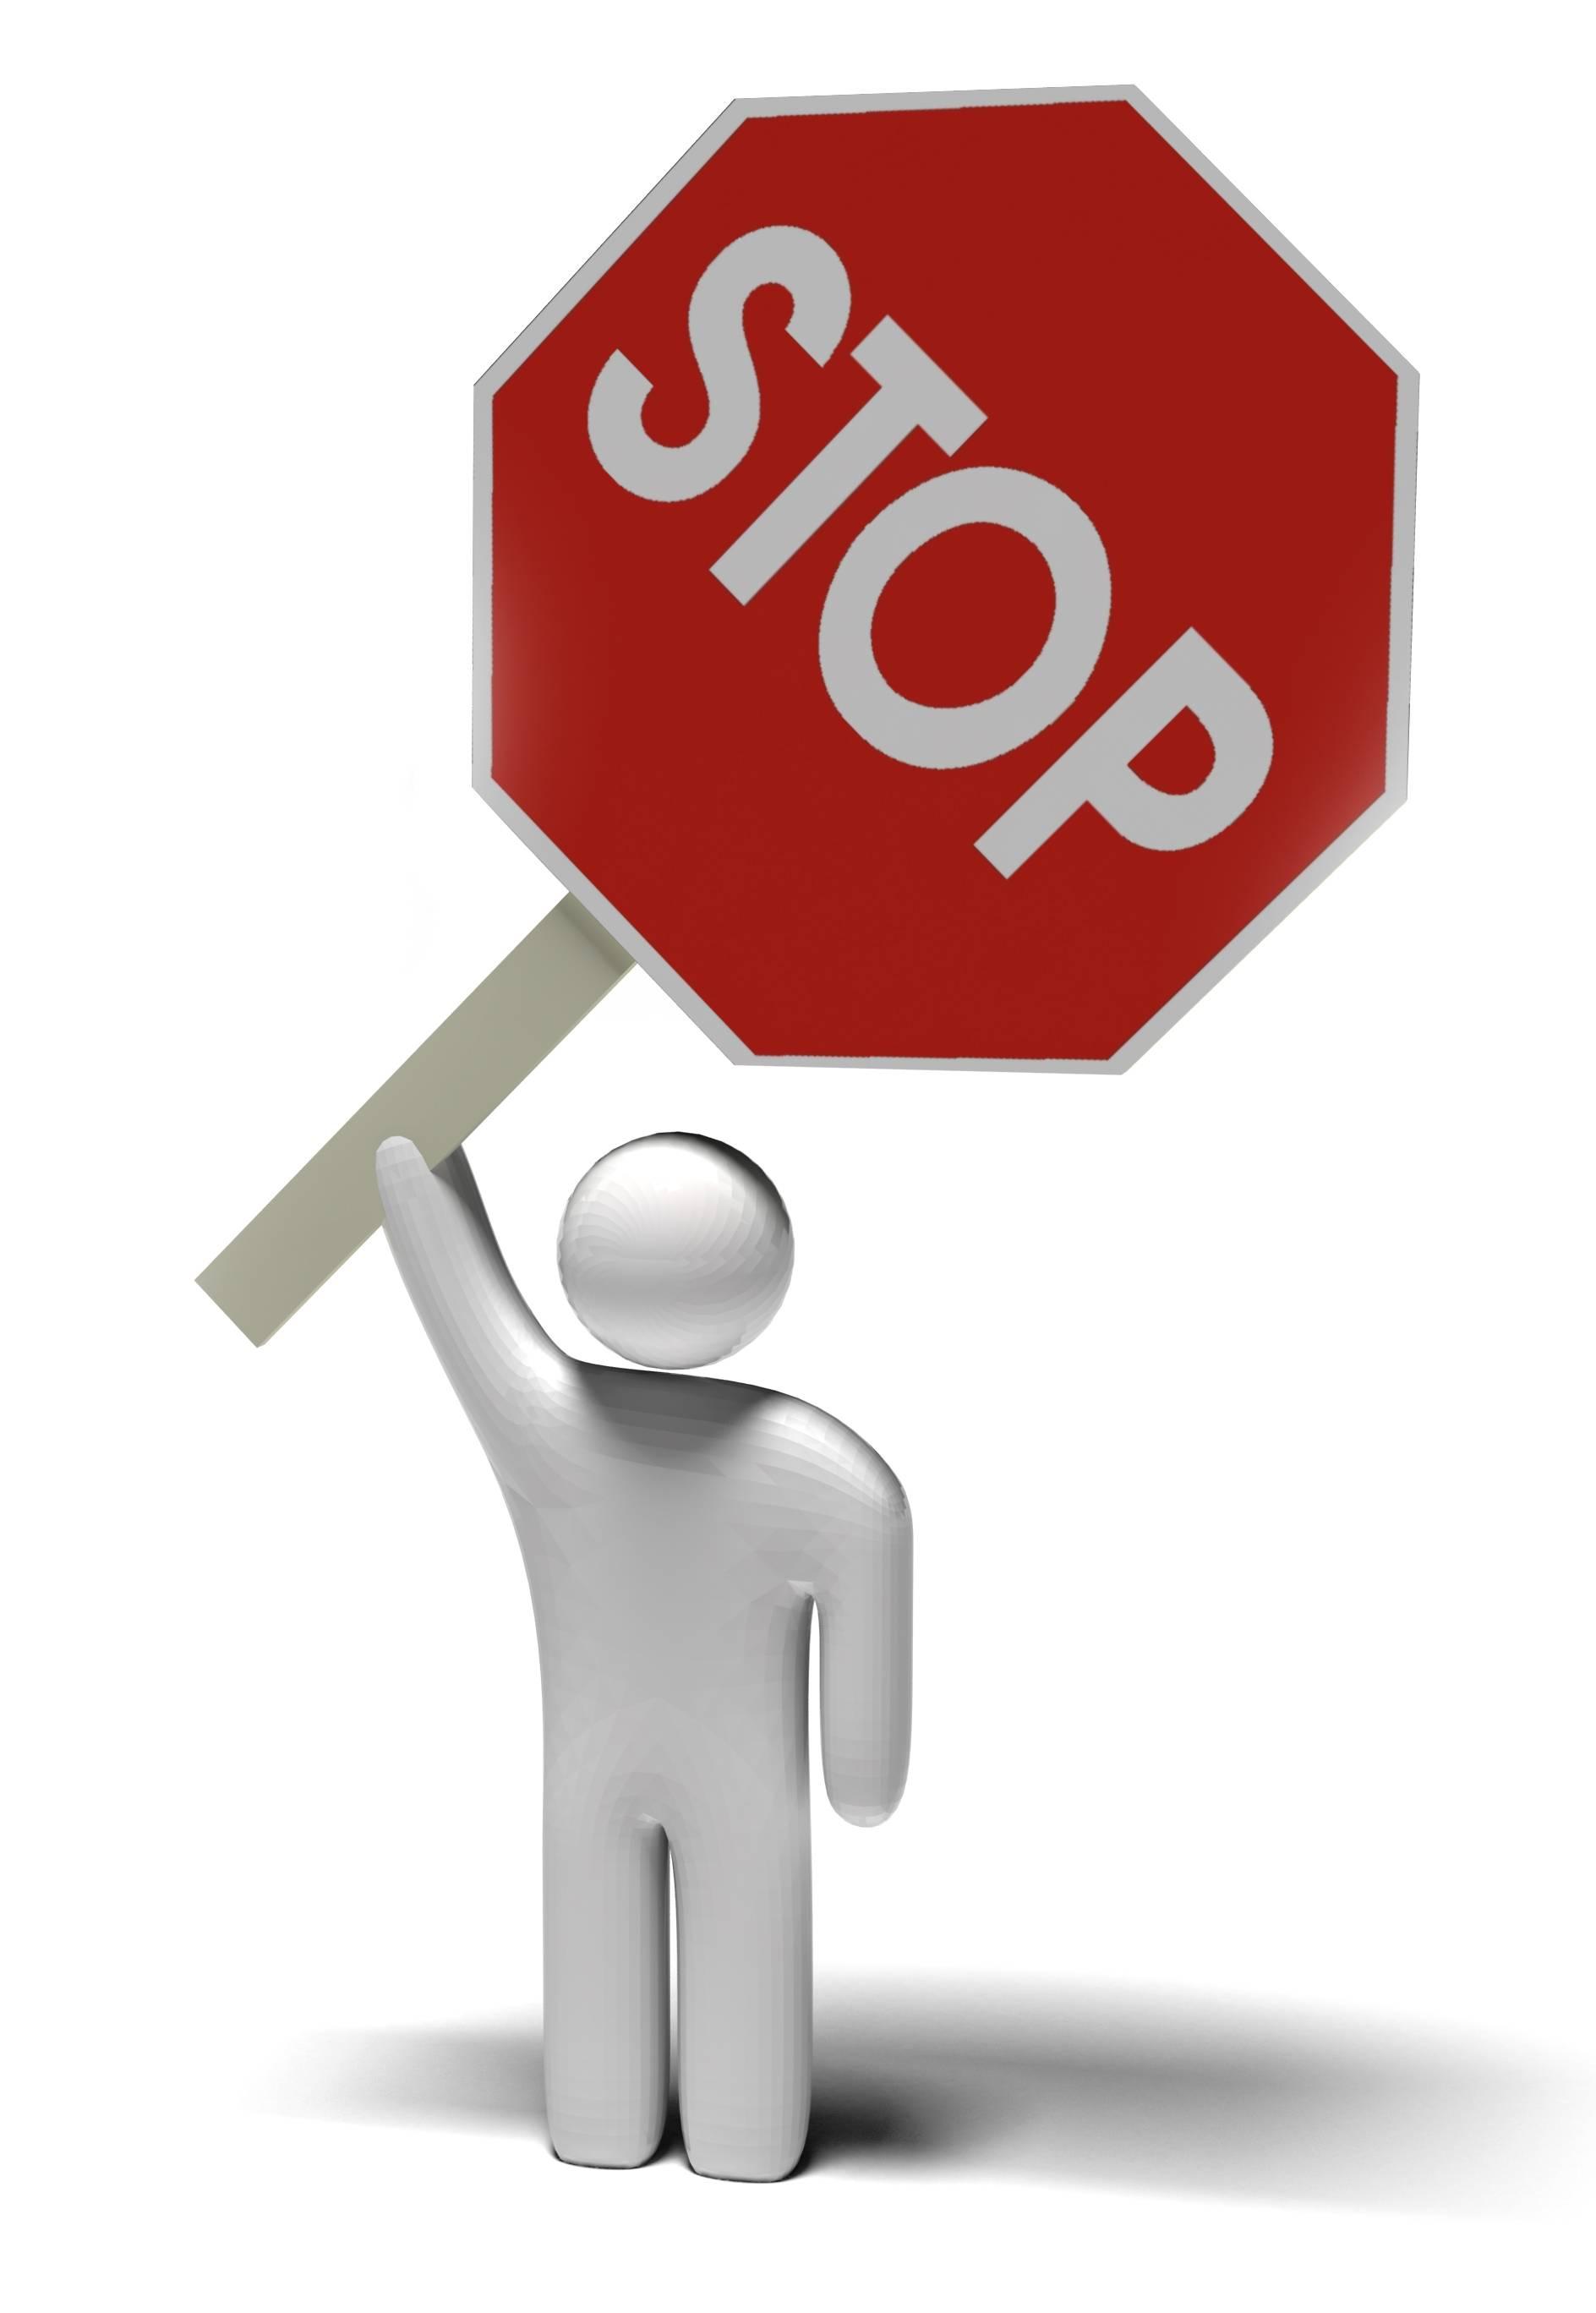 Forex советник - STOP 2.0